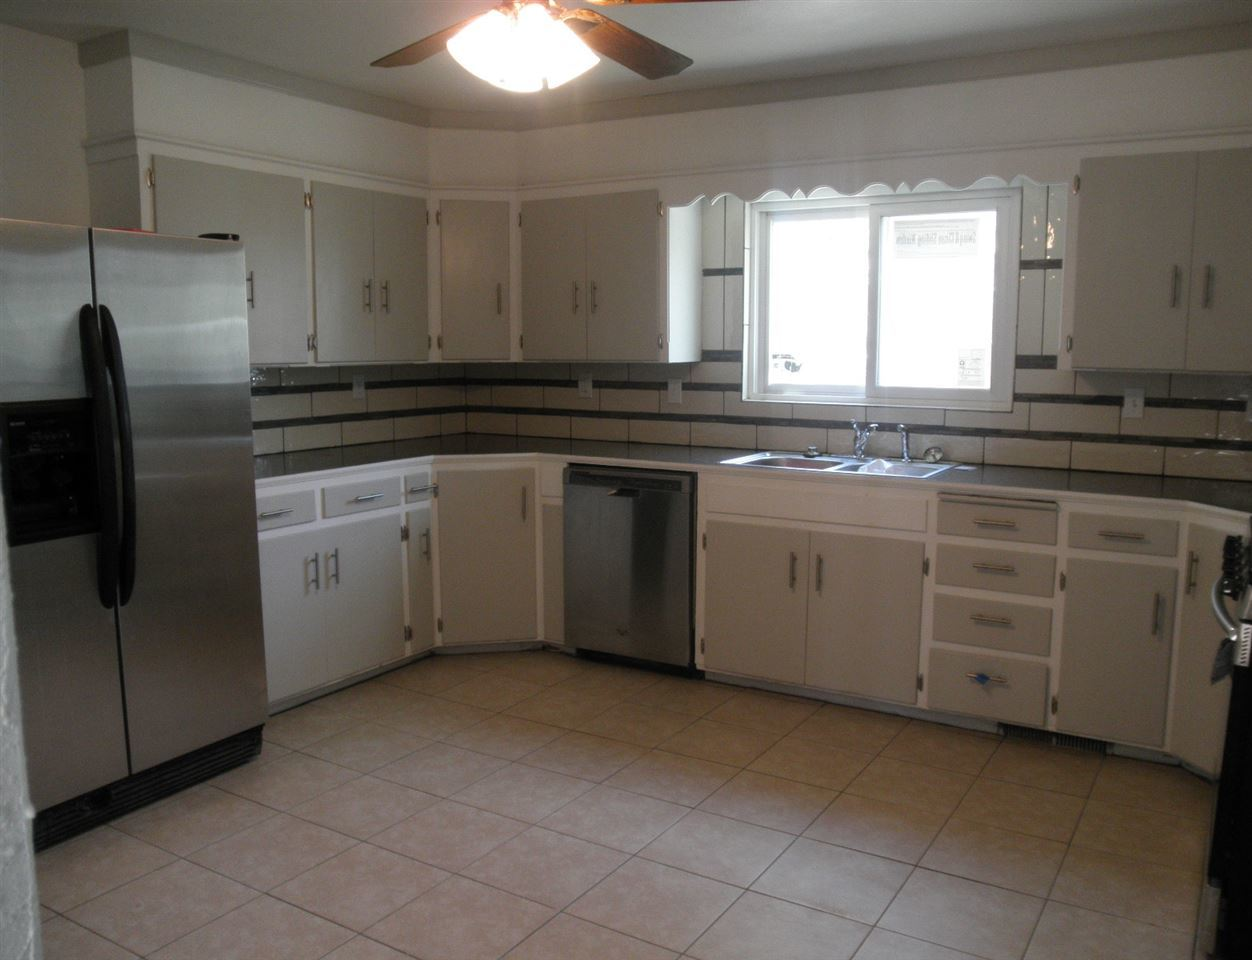 Sold Cross Sale W/ MLS | 189 Tapp Road  Ponca City, OK 74604 14